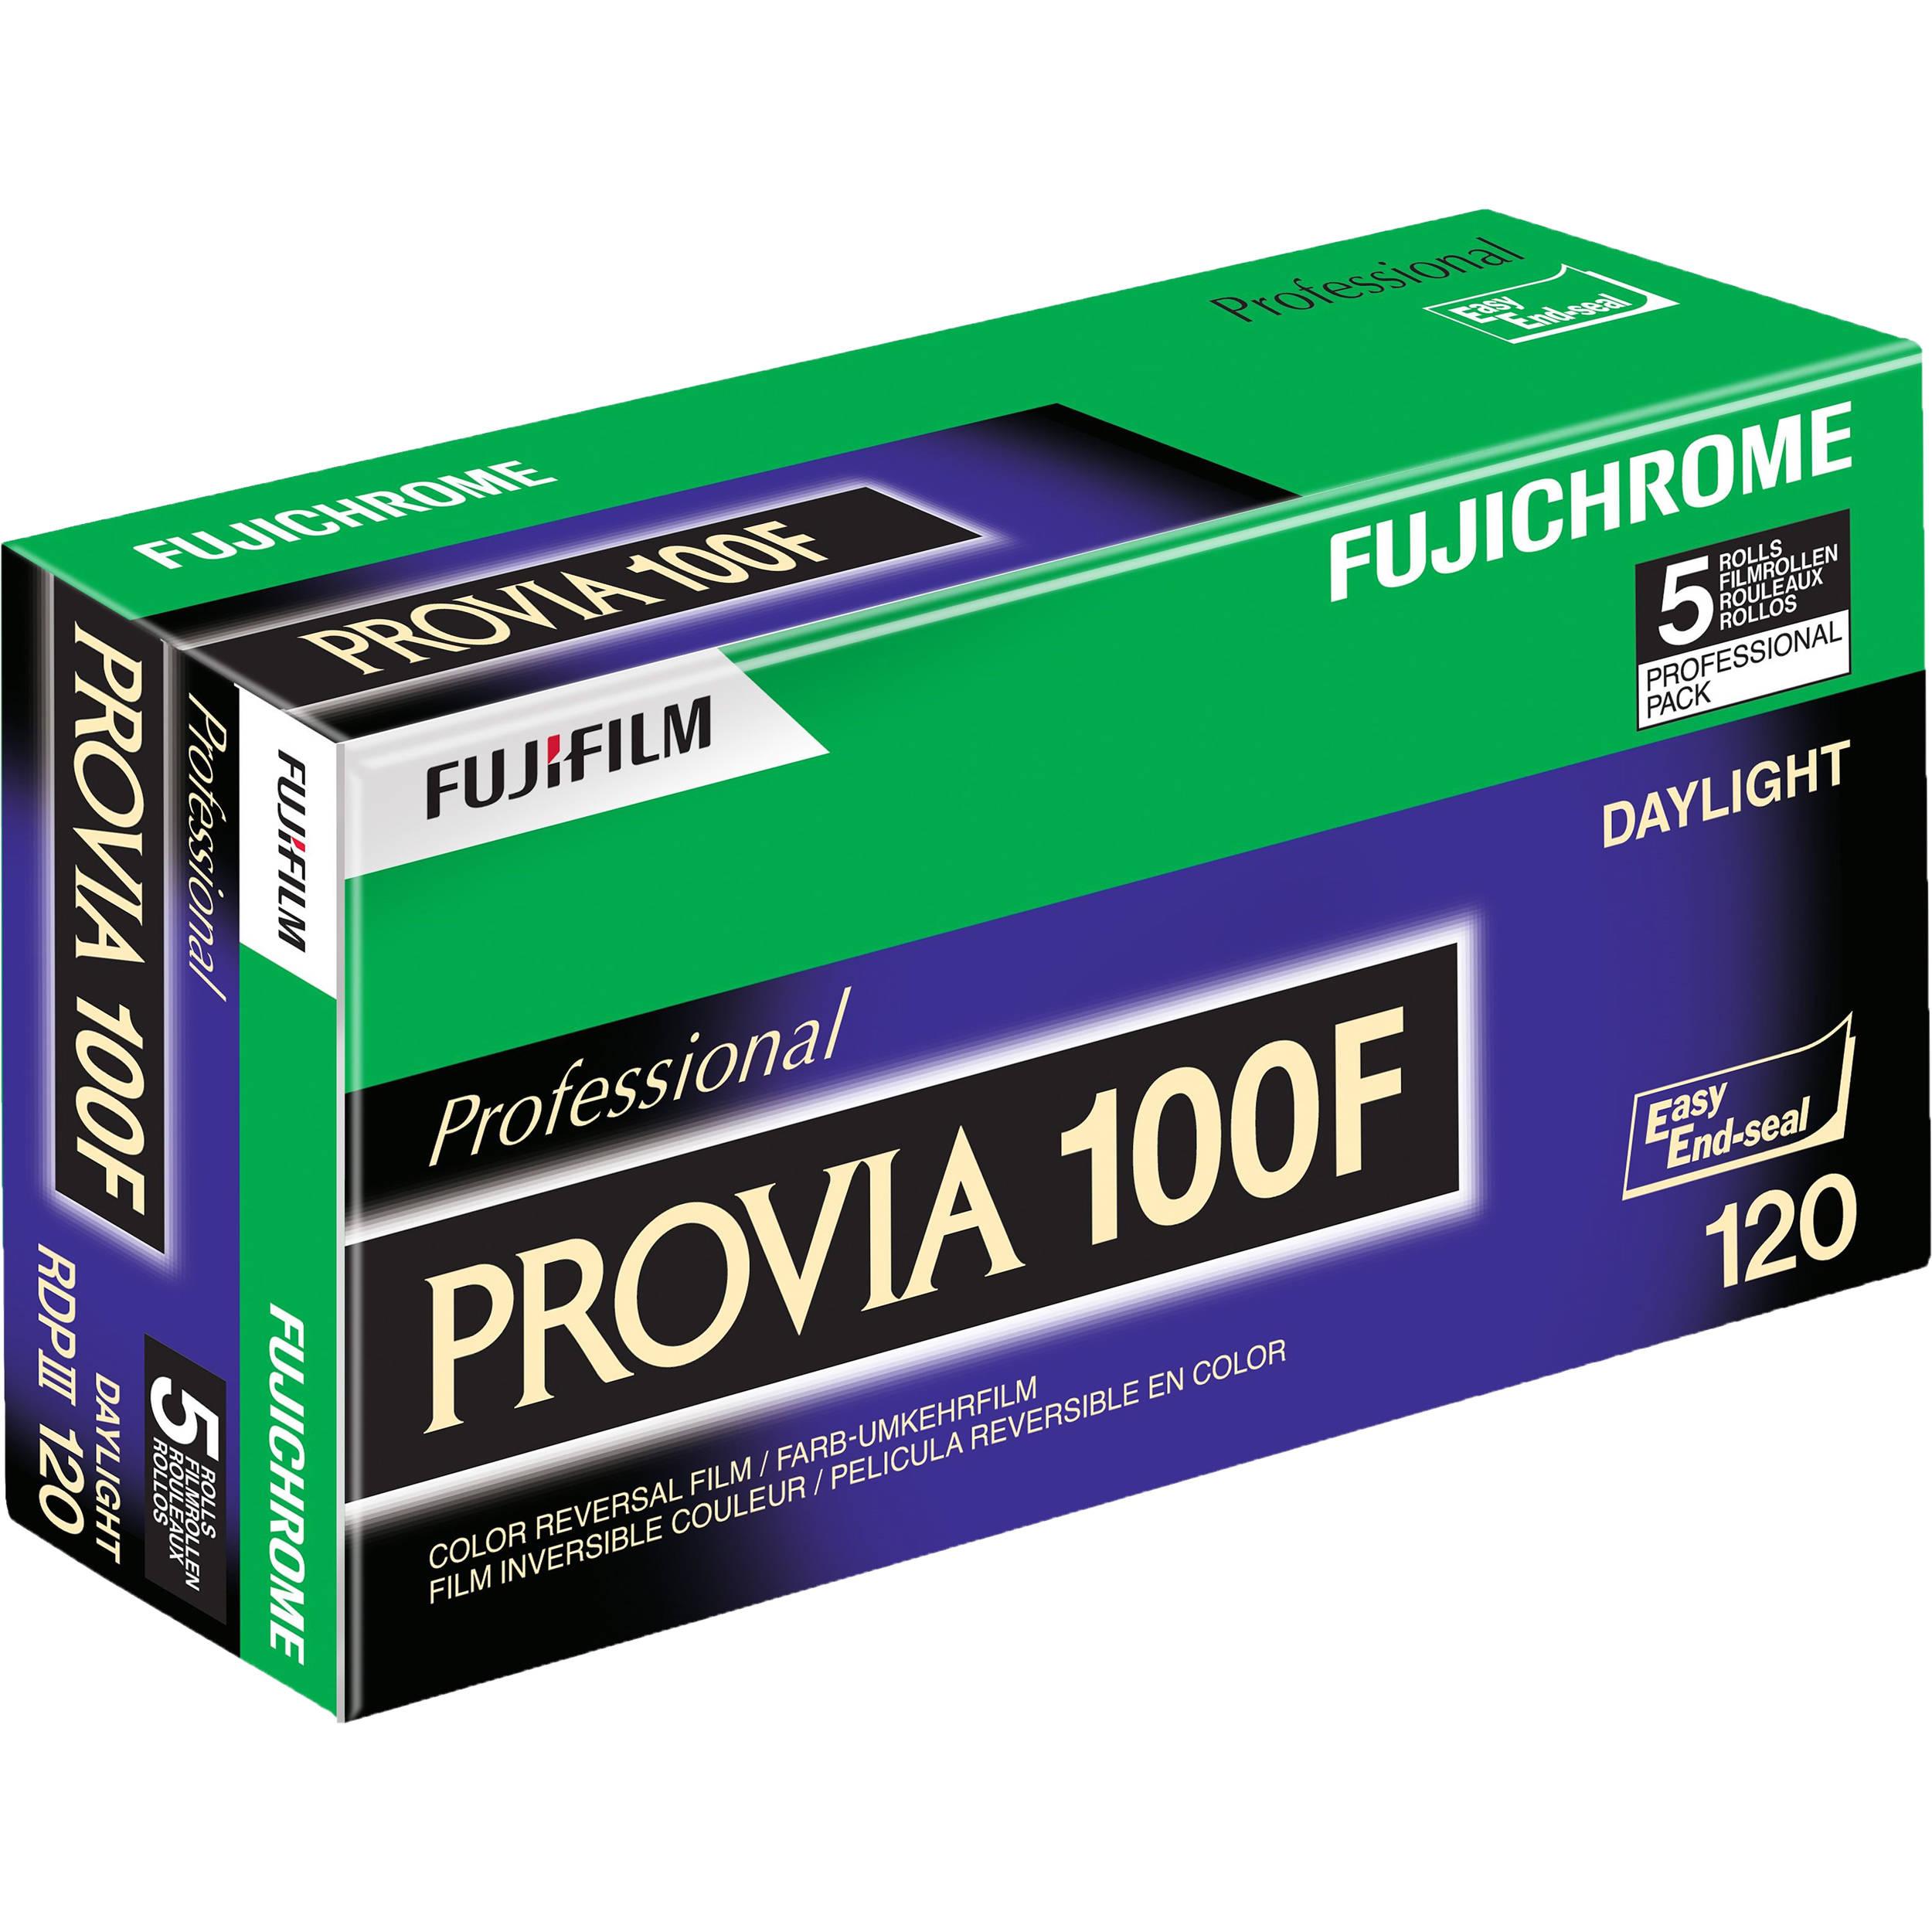 Fujifilm fujichrome provia 100f professional rdp iii 16326092 for What is provia